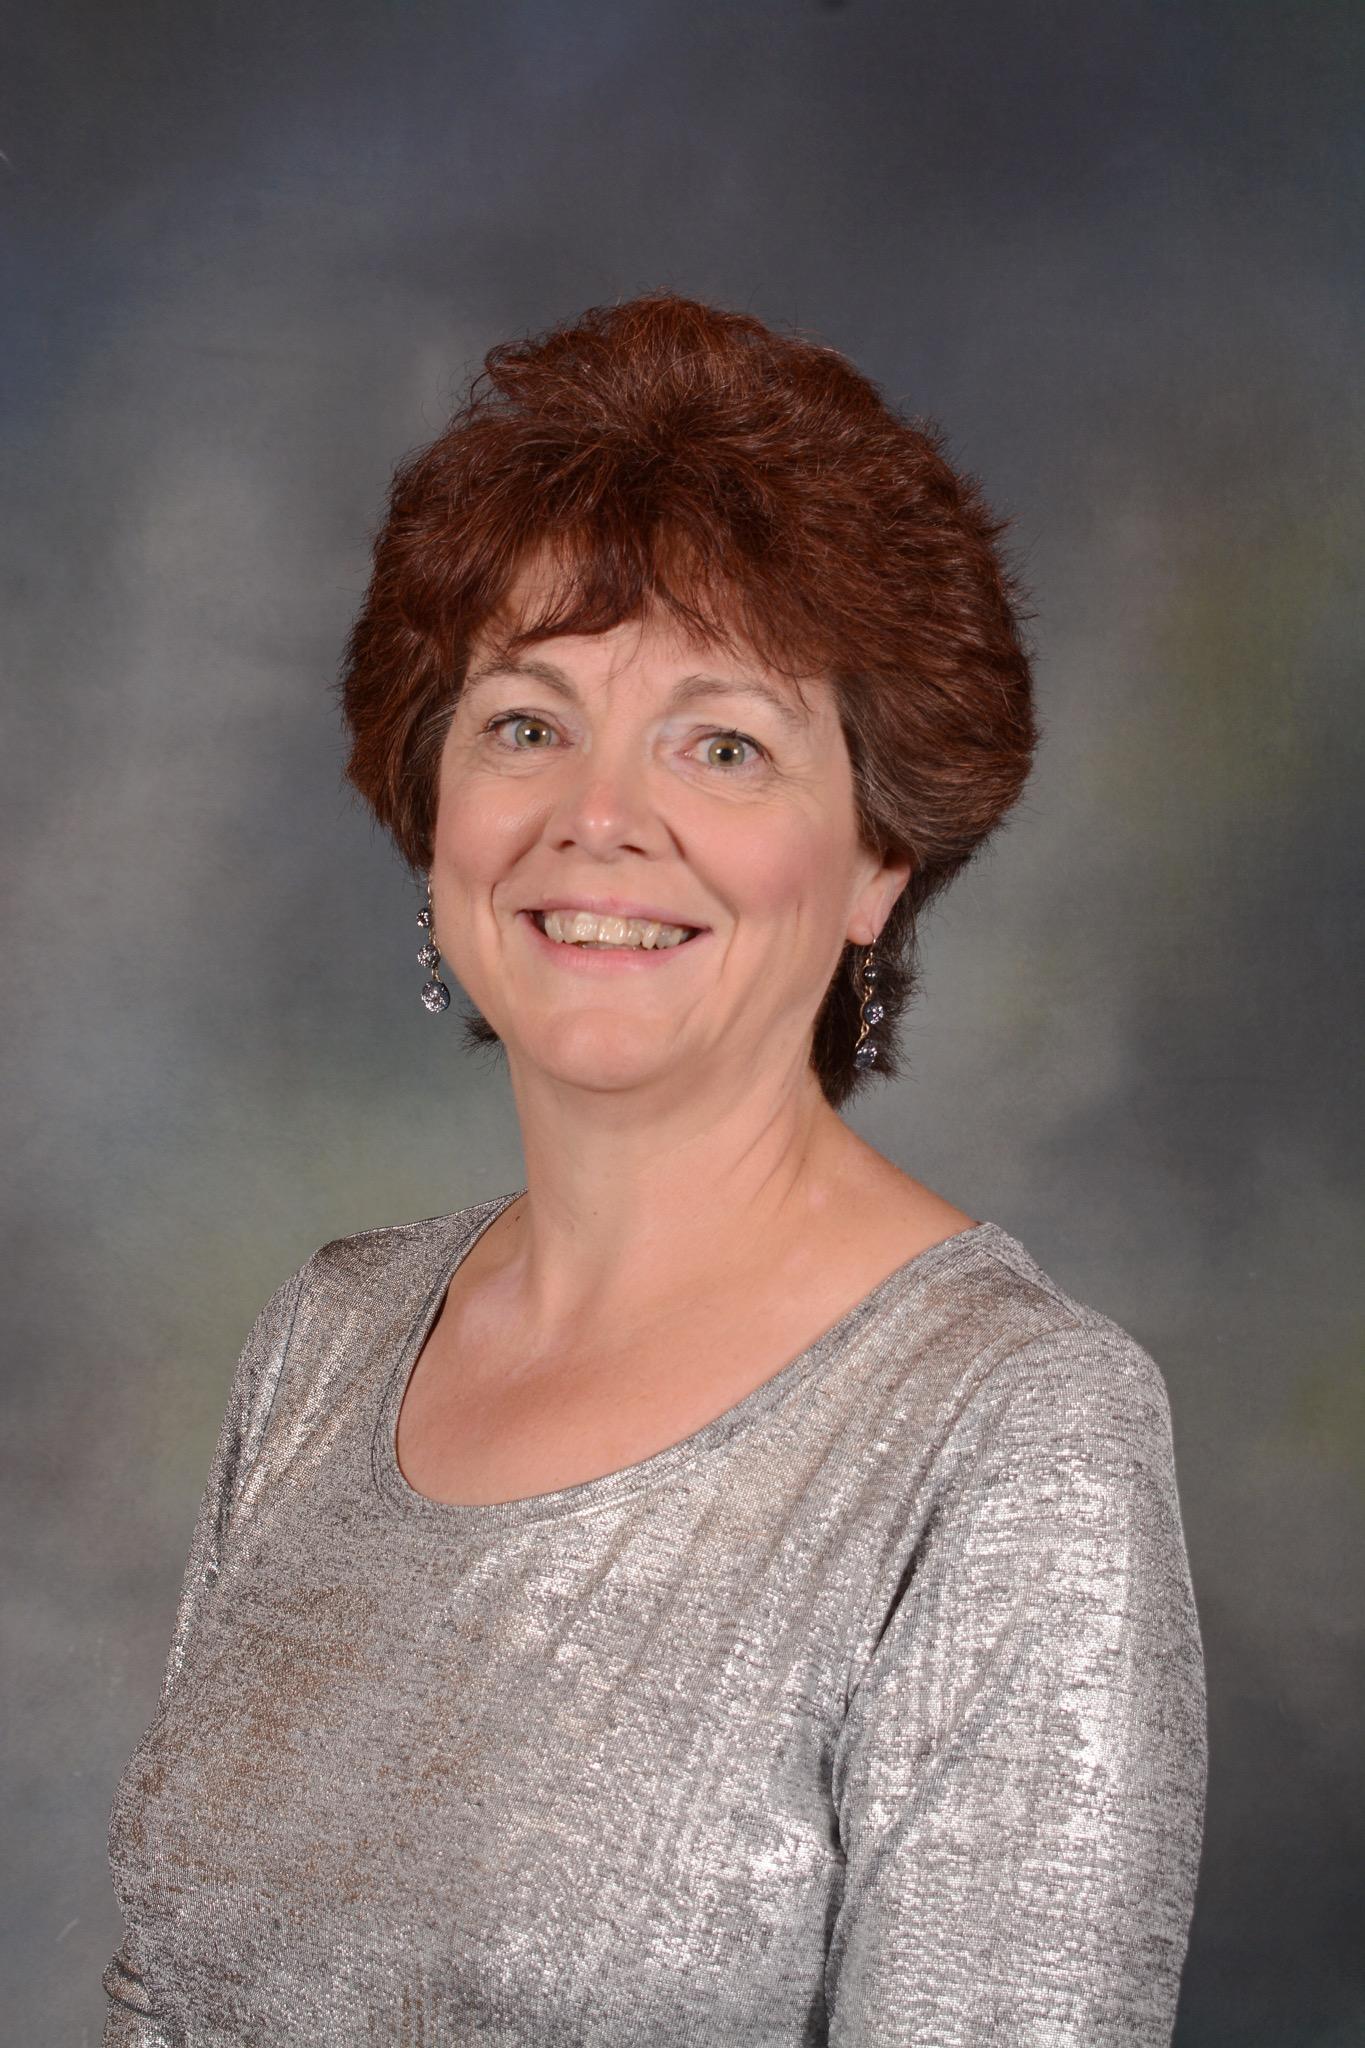 Sherry Norris